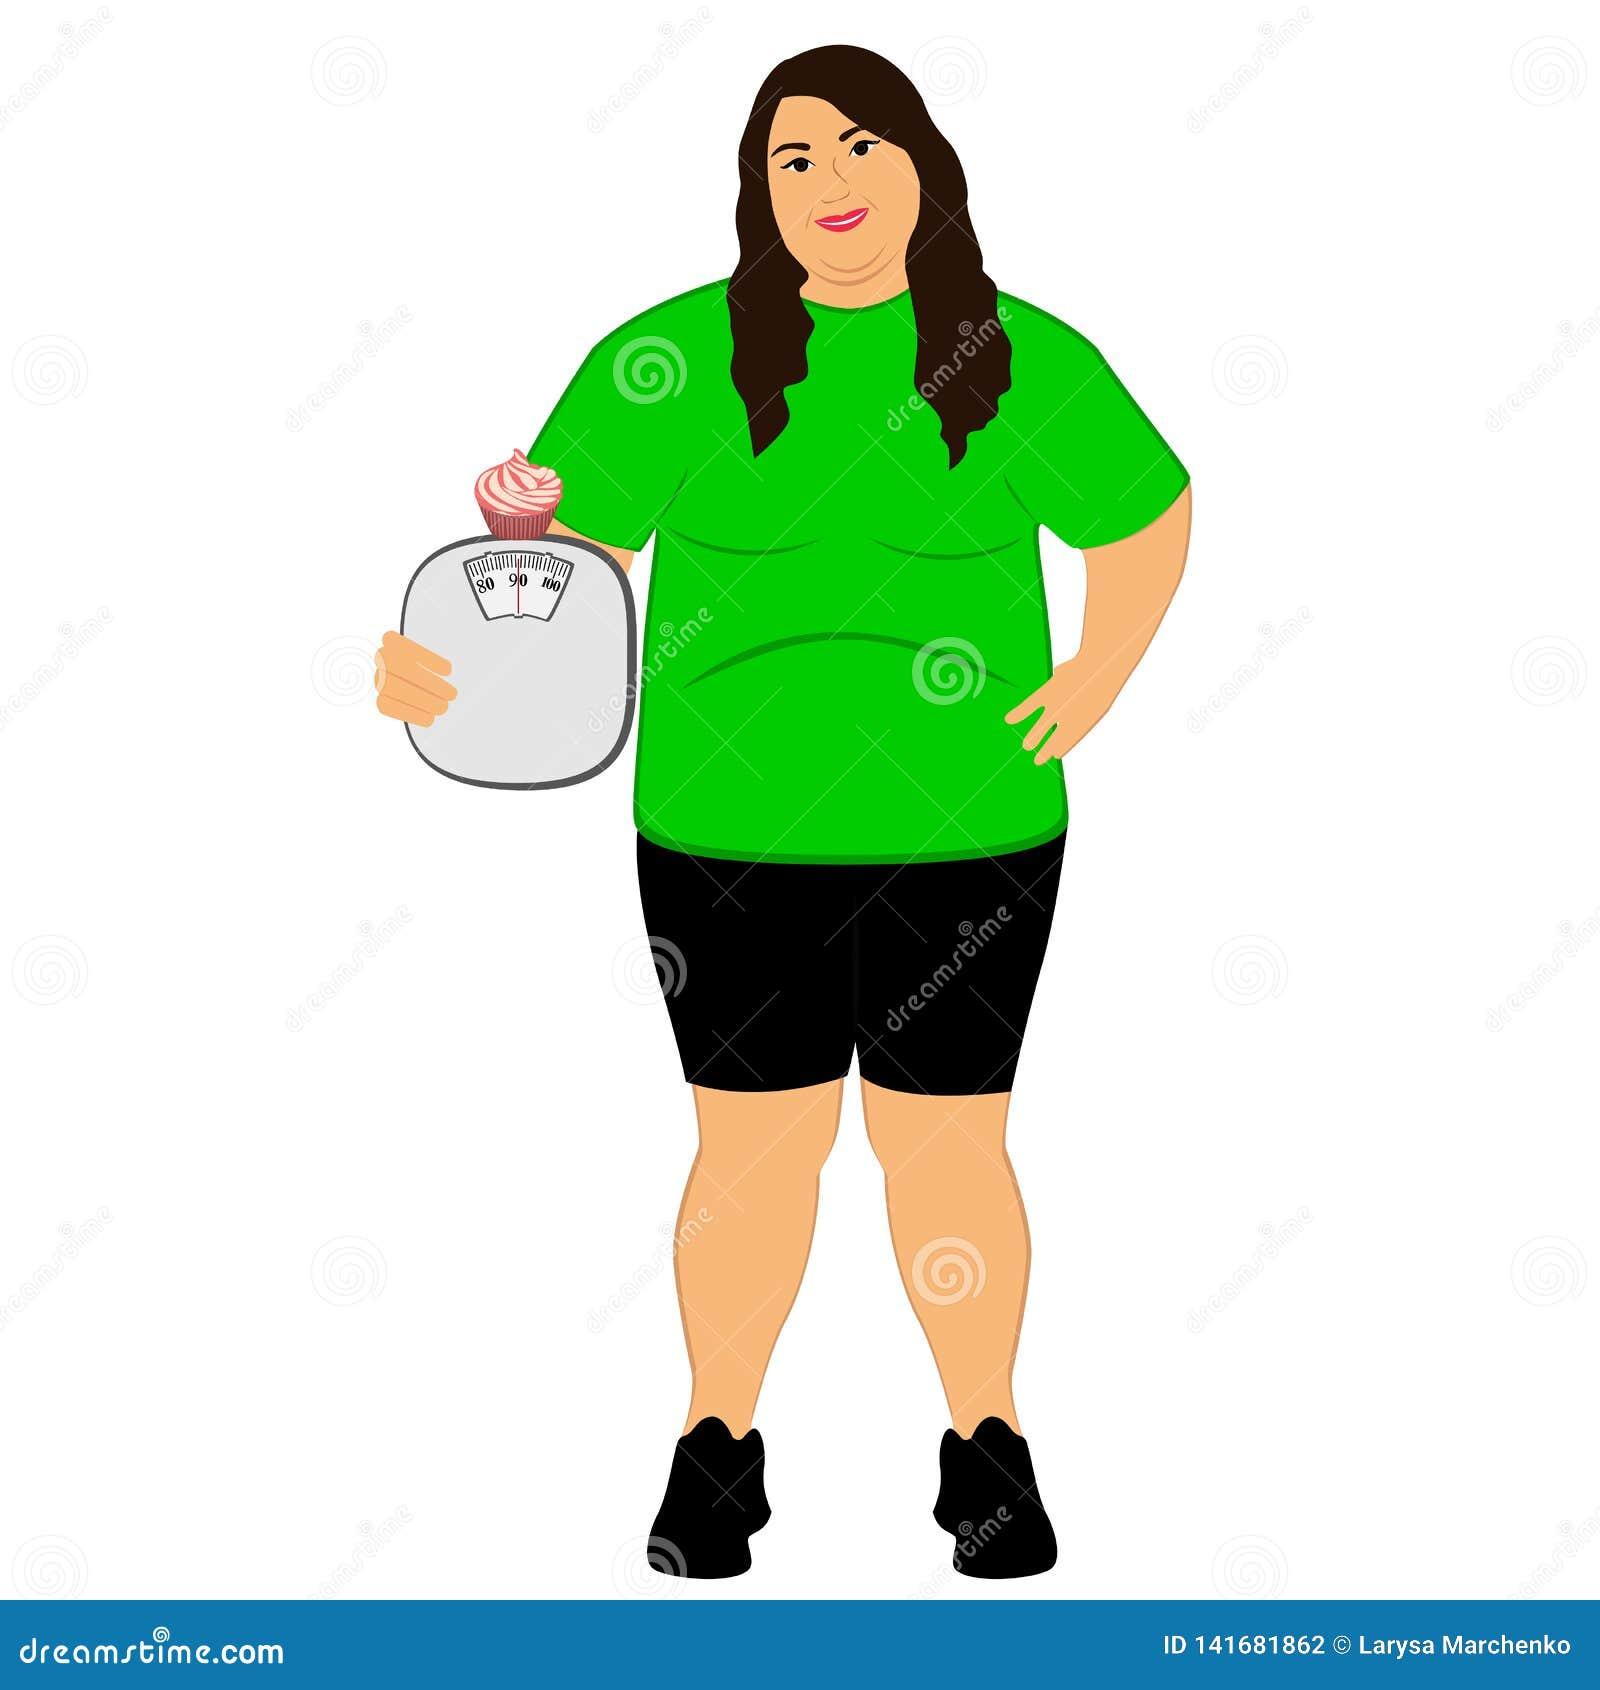 Lifestyle Η επιλογή Παχιά γυναίκα Ανακριβή τρόφιμα ζύγισμα